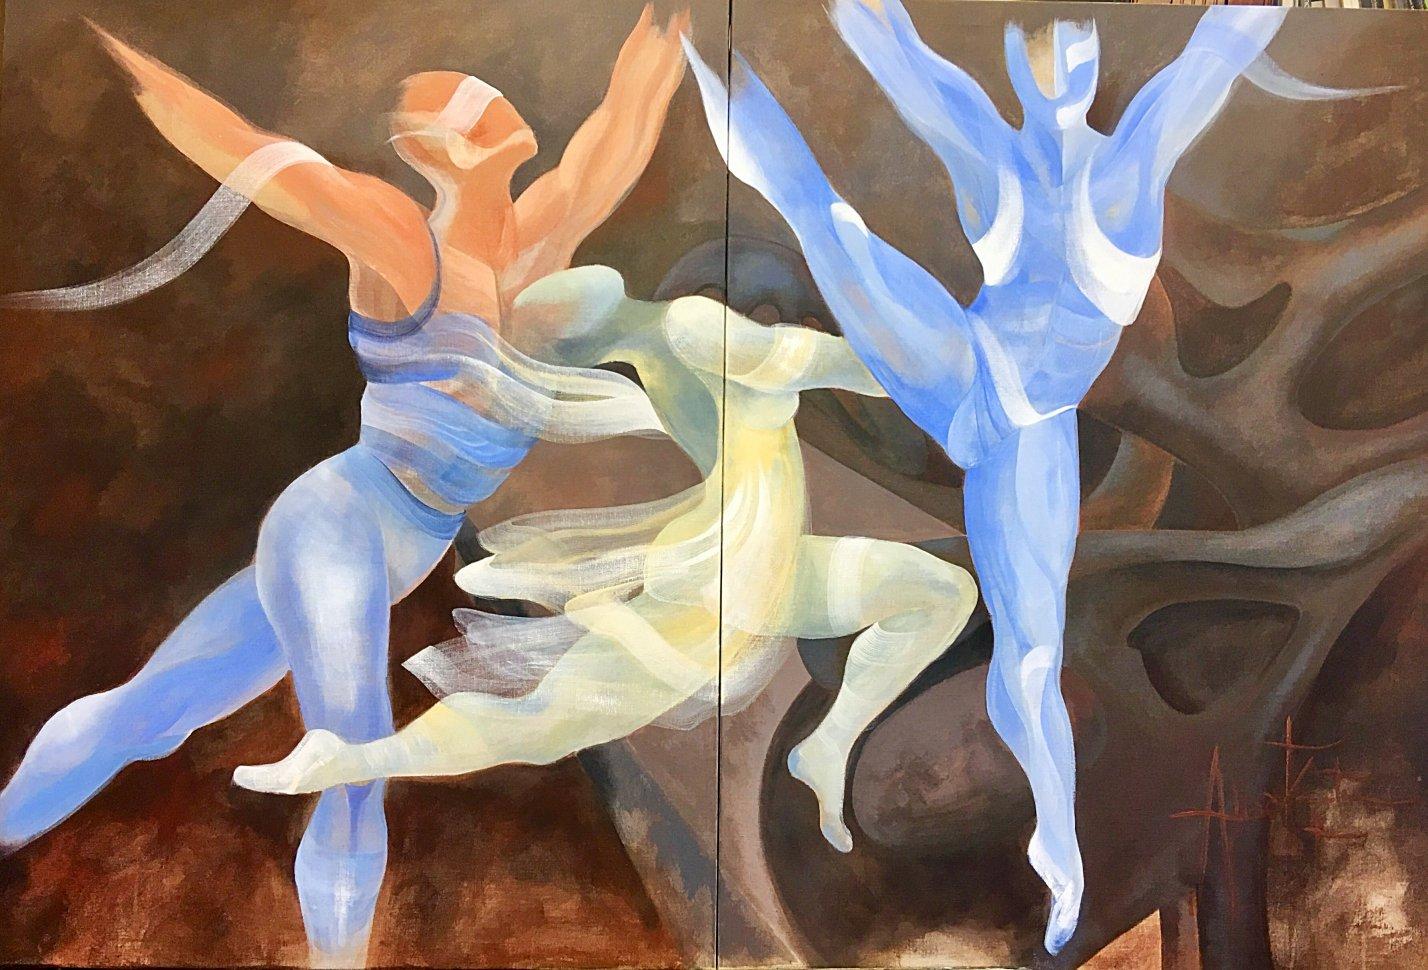 Dansa Gaudiniana (2018) - Alba Roqueta